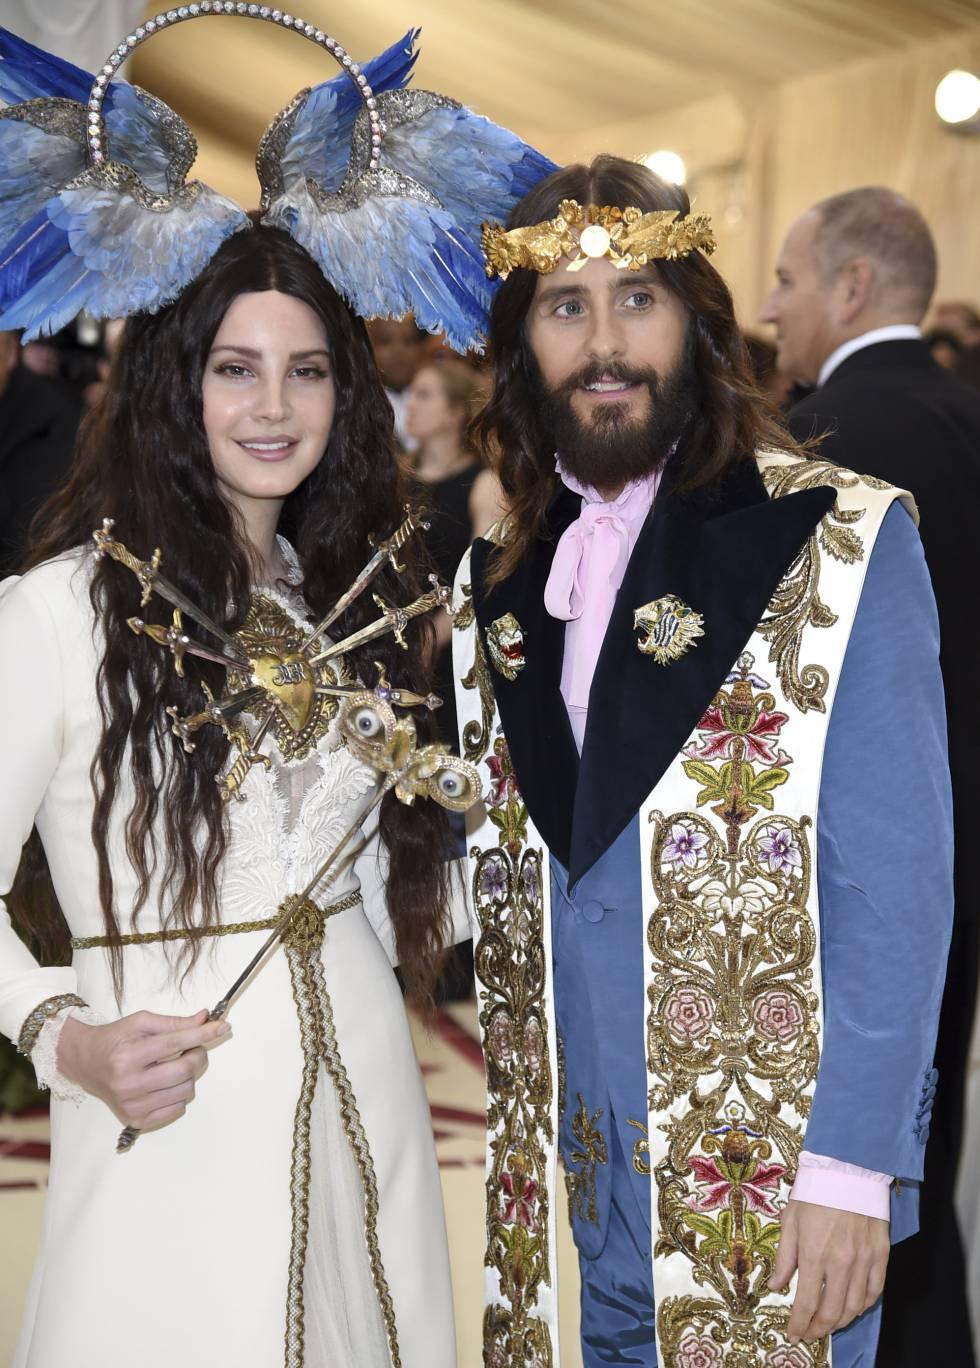 A cantora Lana Del Rey e o ator Jared Leto no MET Gala 2018, a festa do Metropolitan Museum of Art's, de Nova York, inspirado na temática cristã.